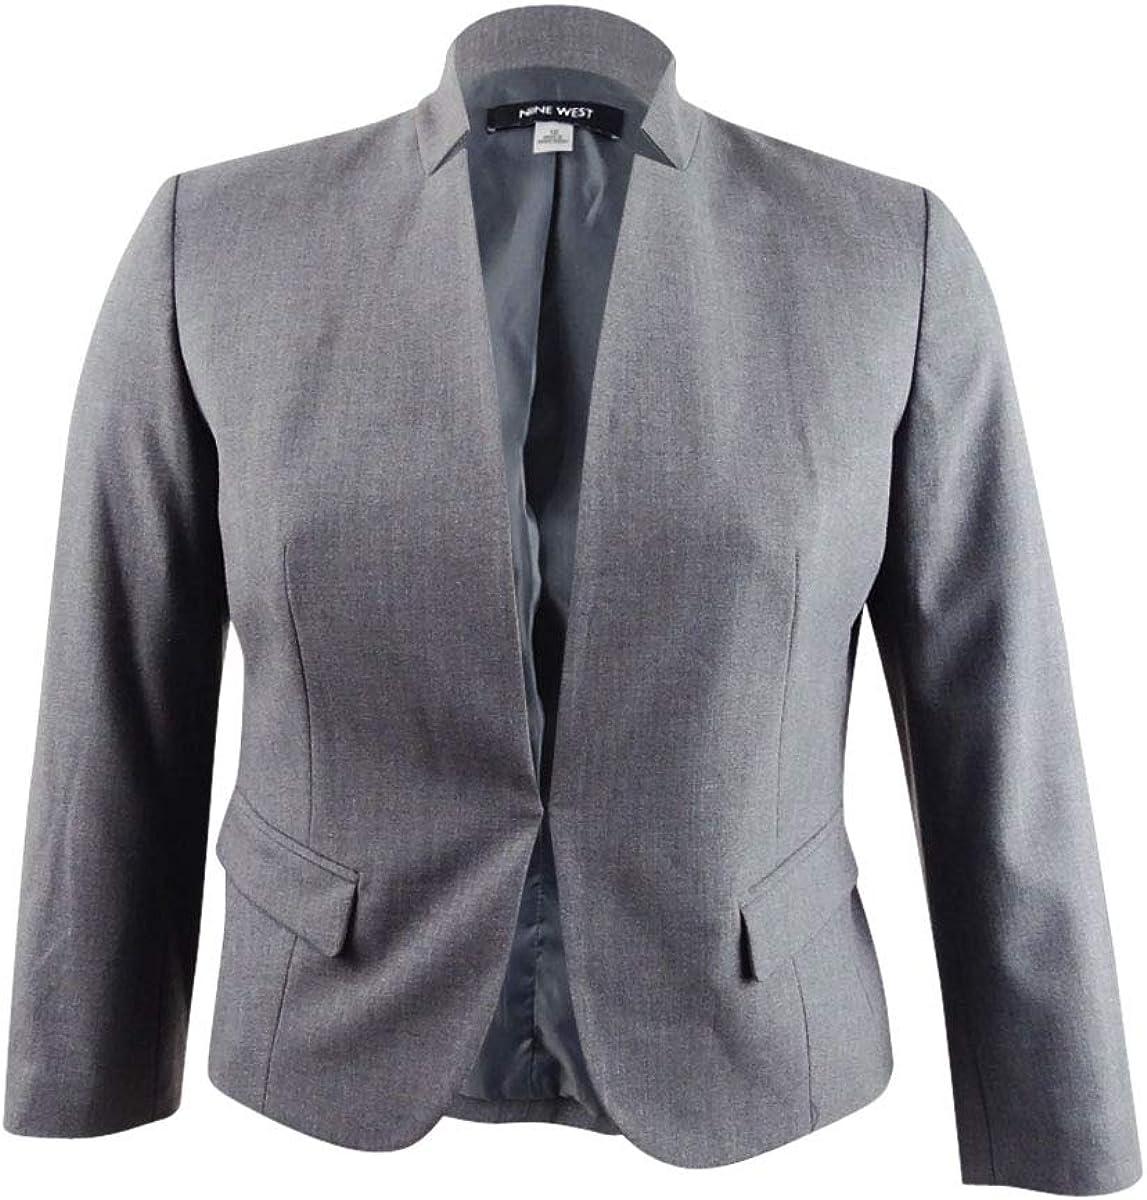 NINE WEST Women's Stand Back Spring new work Collar Kiss JKT Front Super-cheap